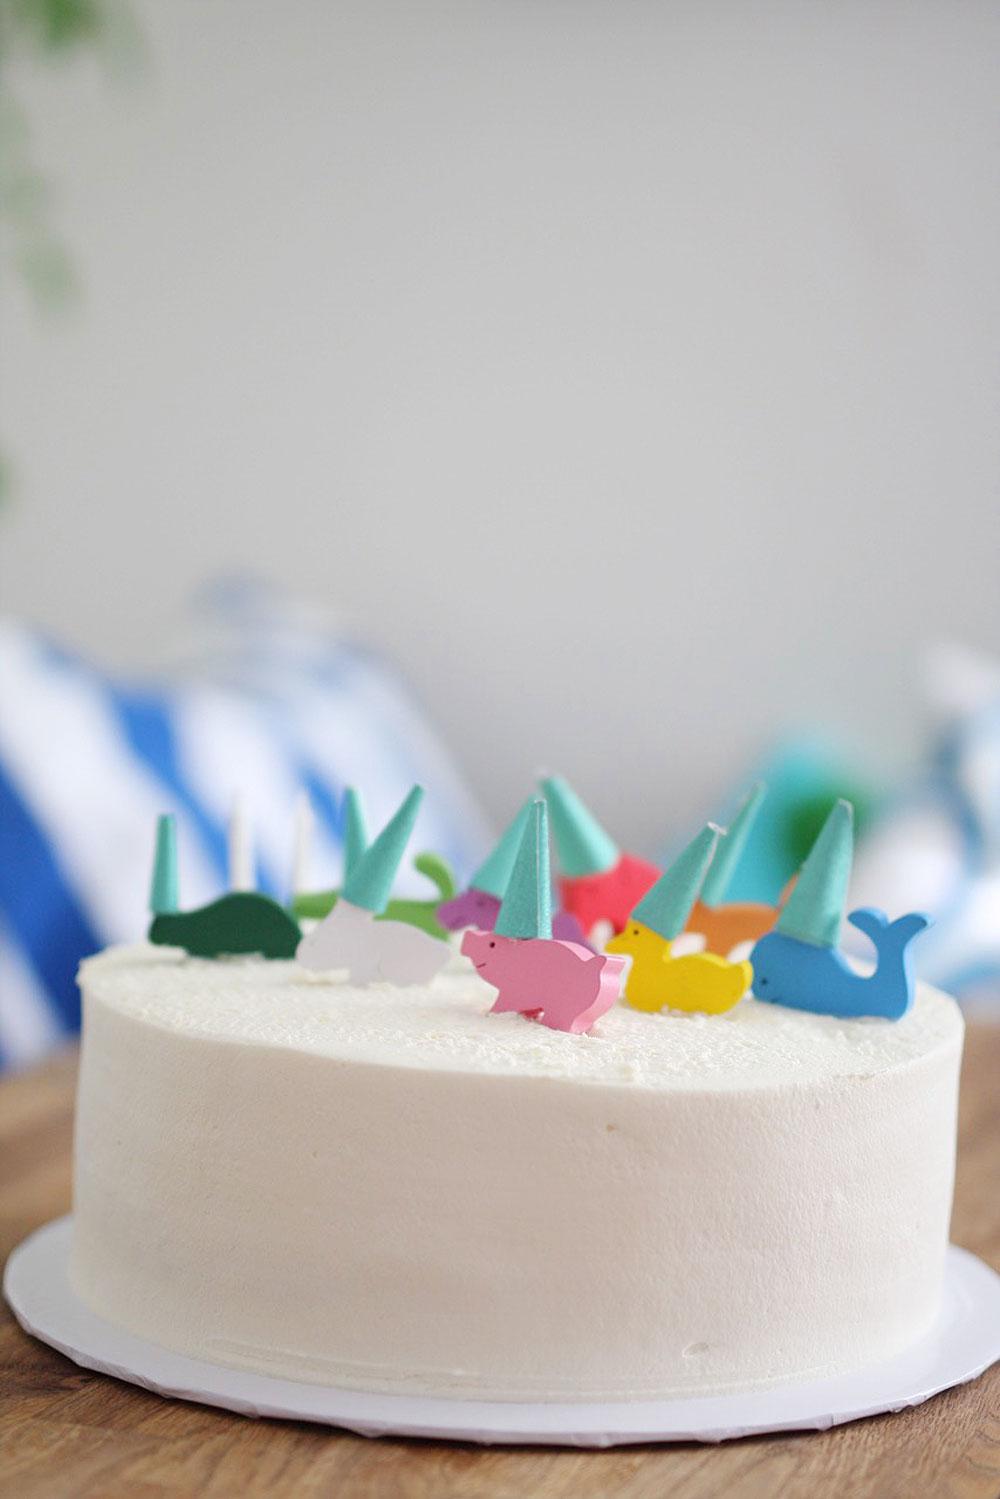 Jestcafe.com--Max's-birthday-cake3